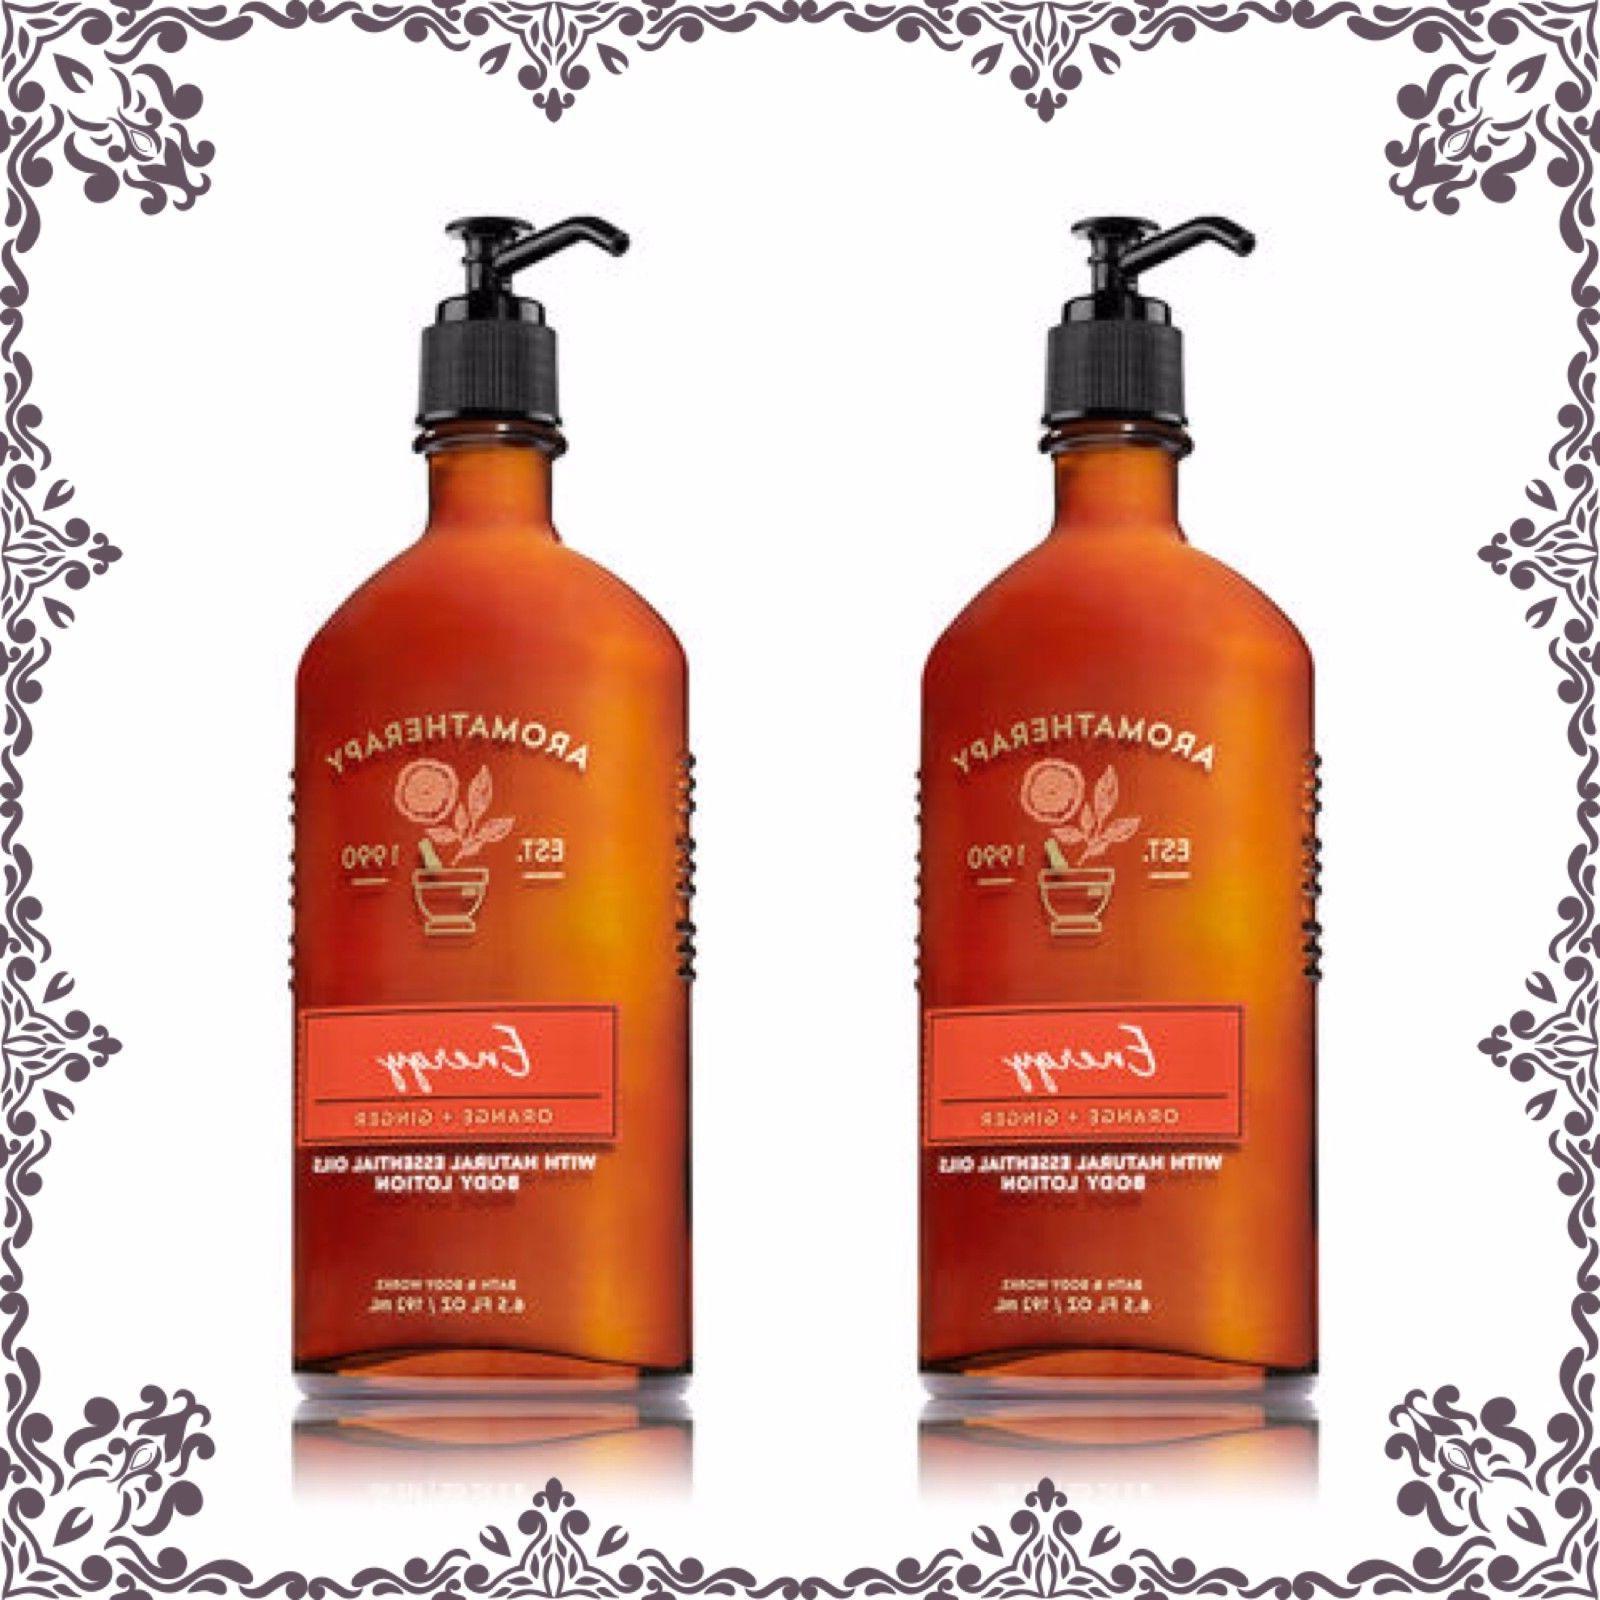 2 bath and body works aromatherapy energy